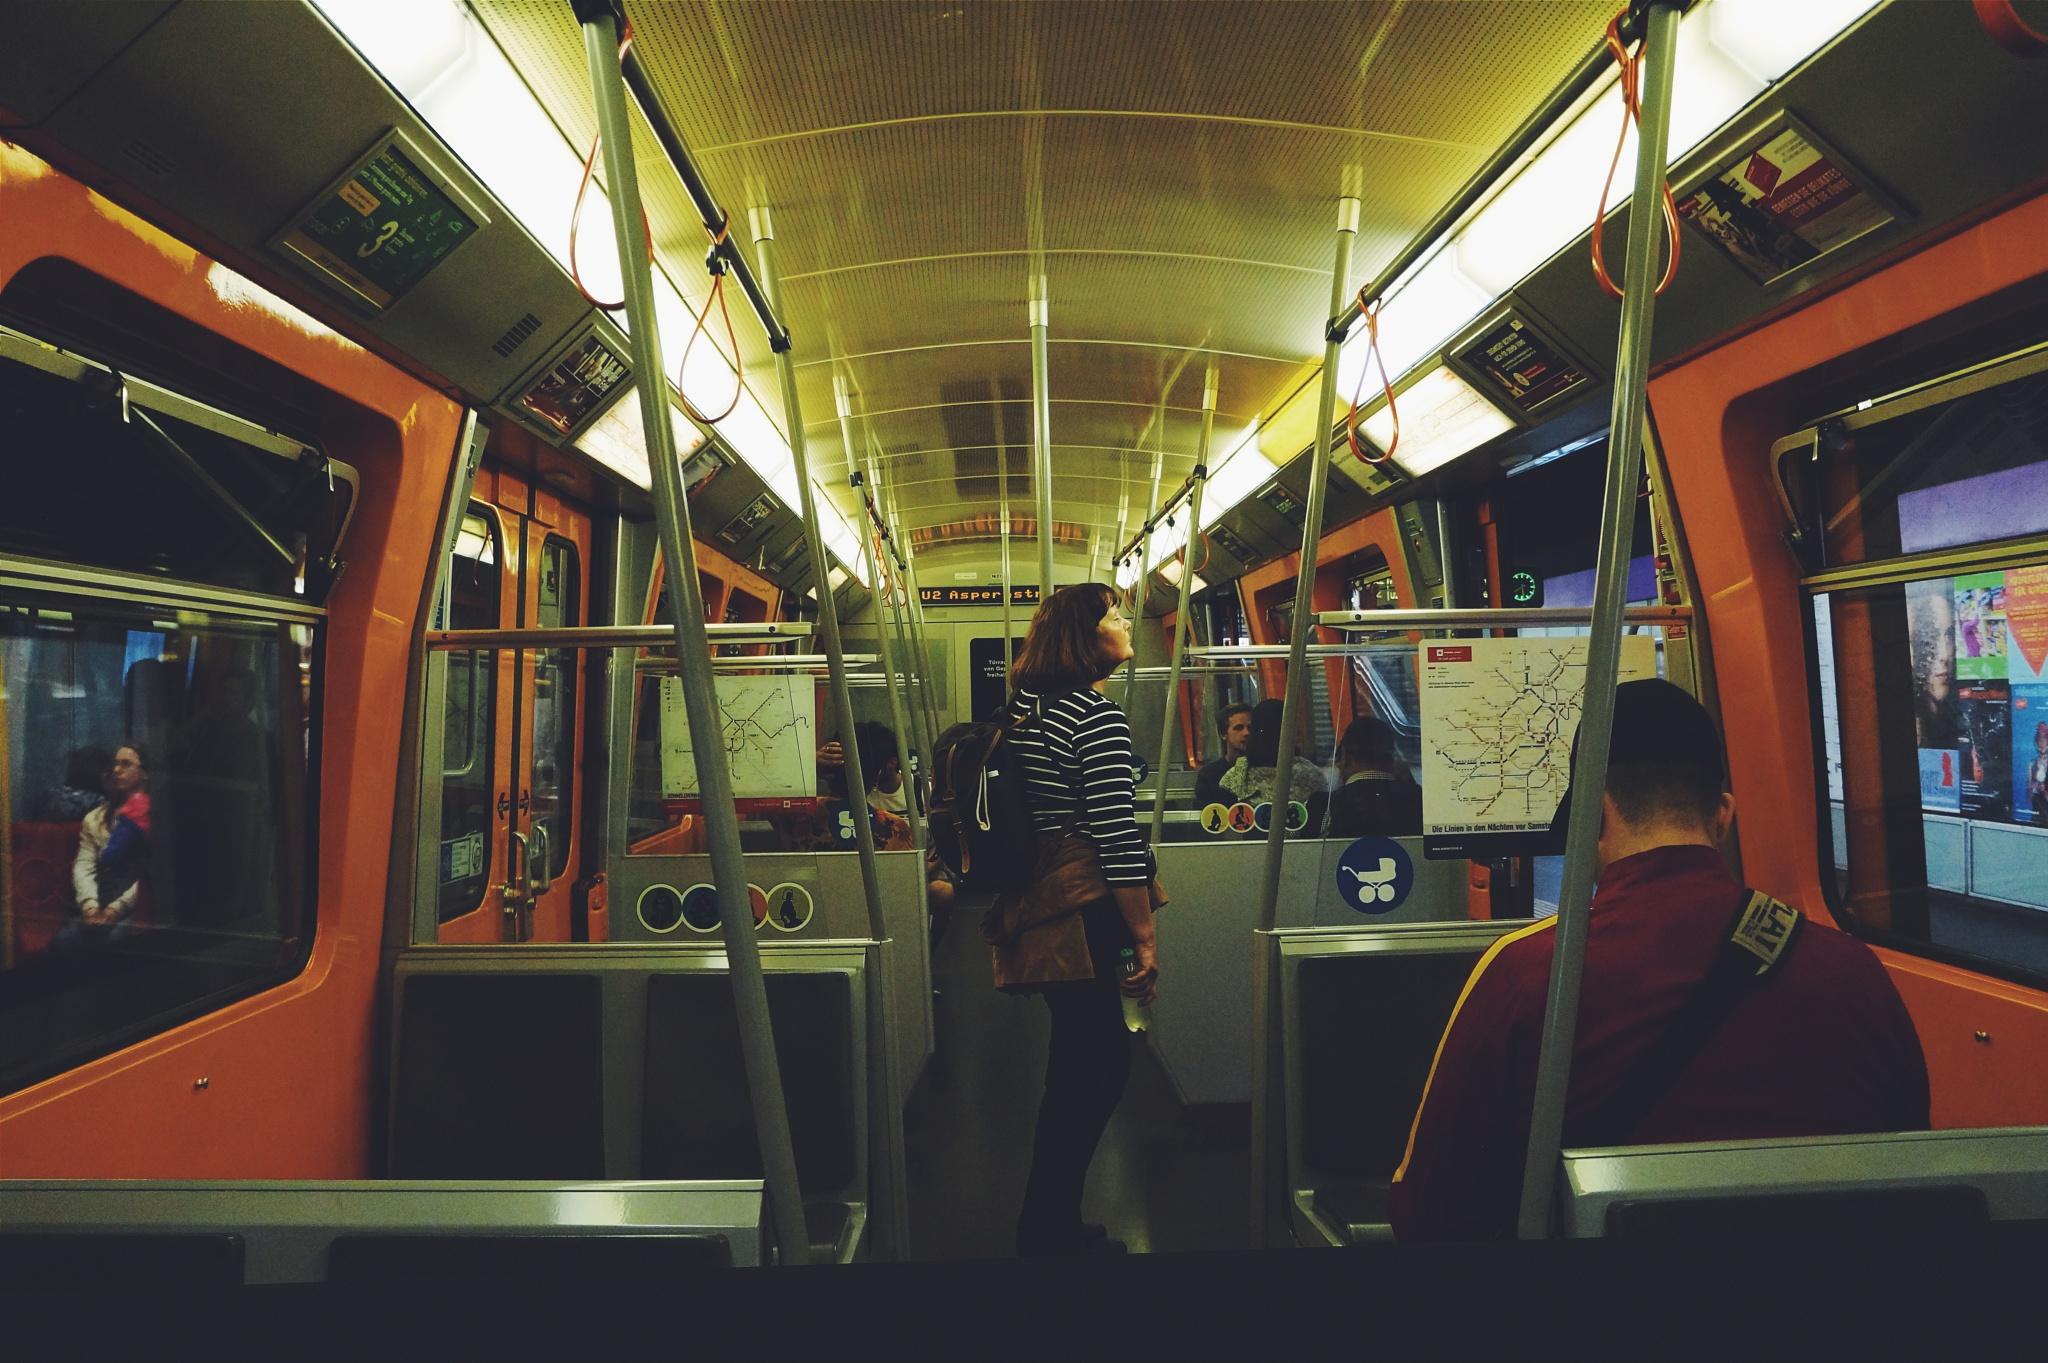 Midnight in the subway by Sabrina Alberti